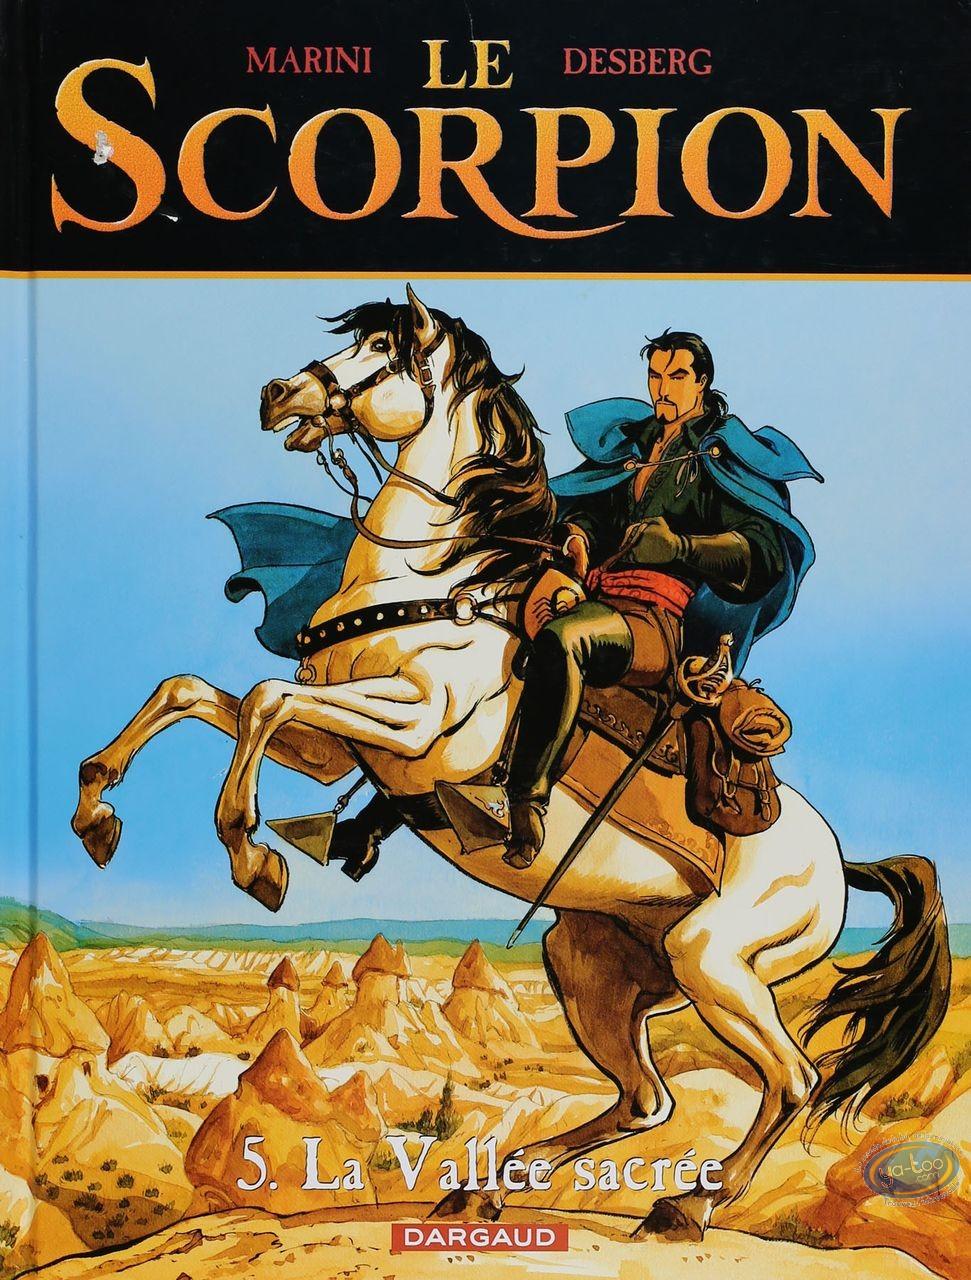 Listed European Comic Books, Scorpion (Le) : La Vallee sacree (nearly good condition)